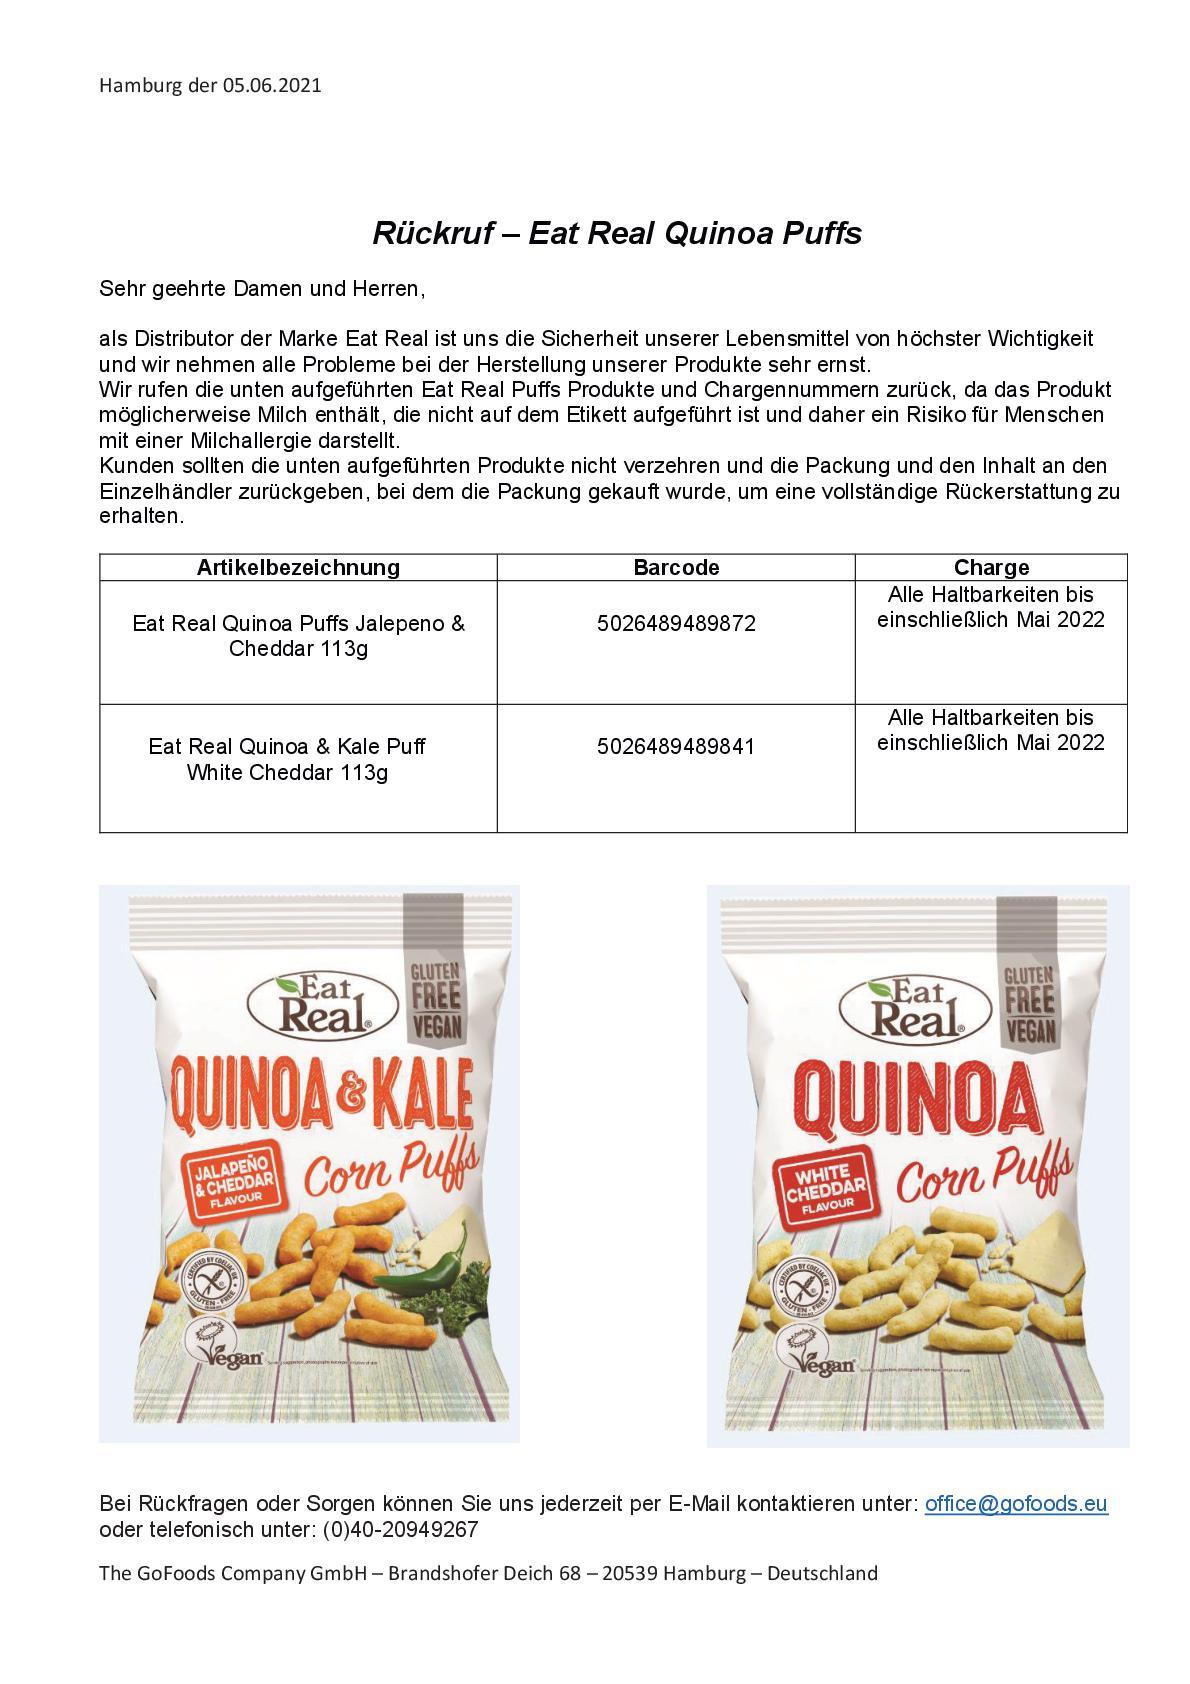 Eat Real Quinoa & Kale Corn Puffs Jalapeno & Cheddar und